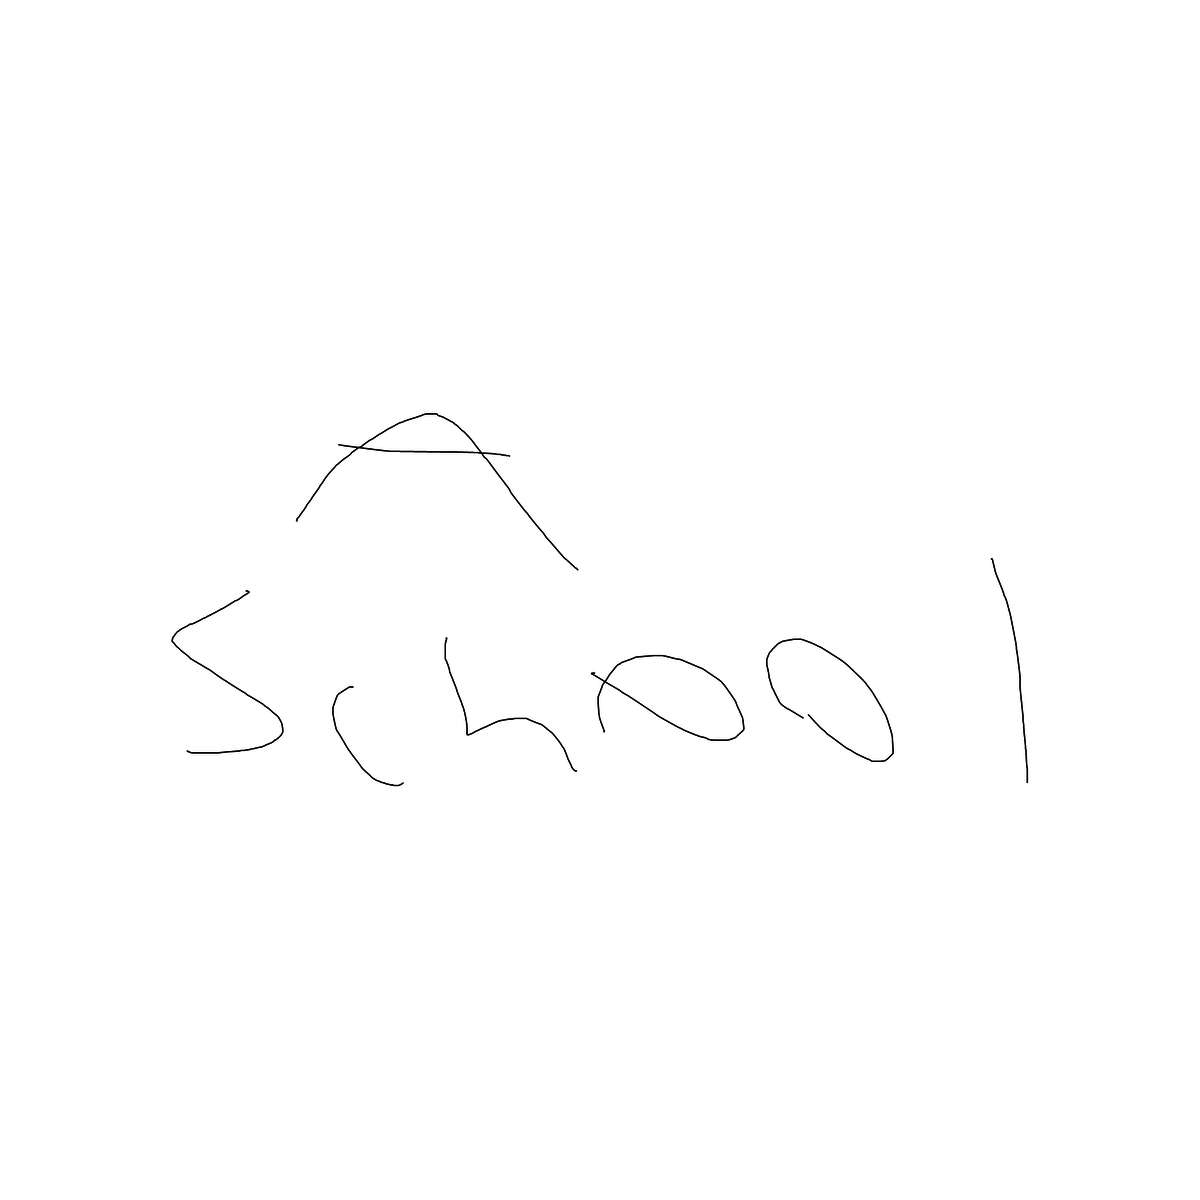 BAAAM drawing#2604 lat:50.2663917541503900lng: -119.2672271728515600